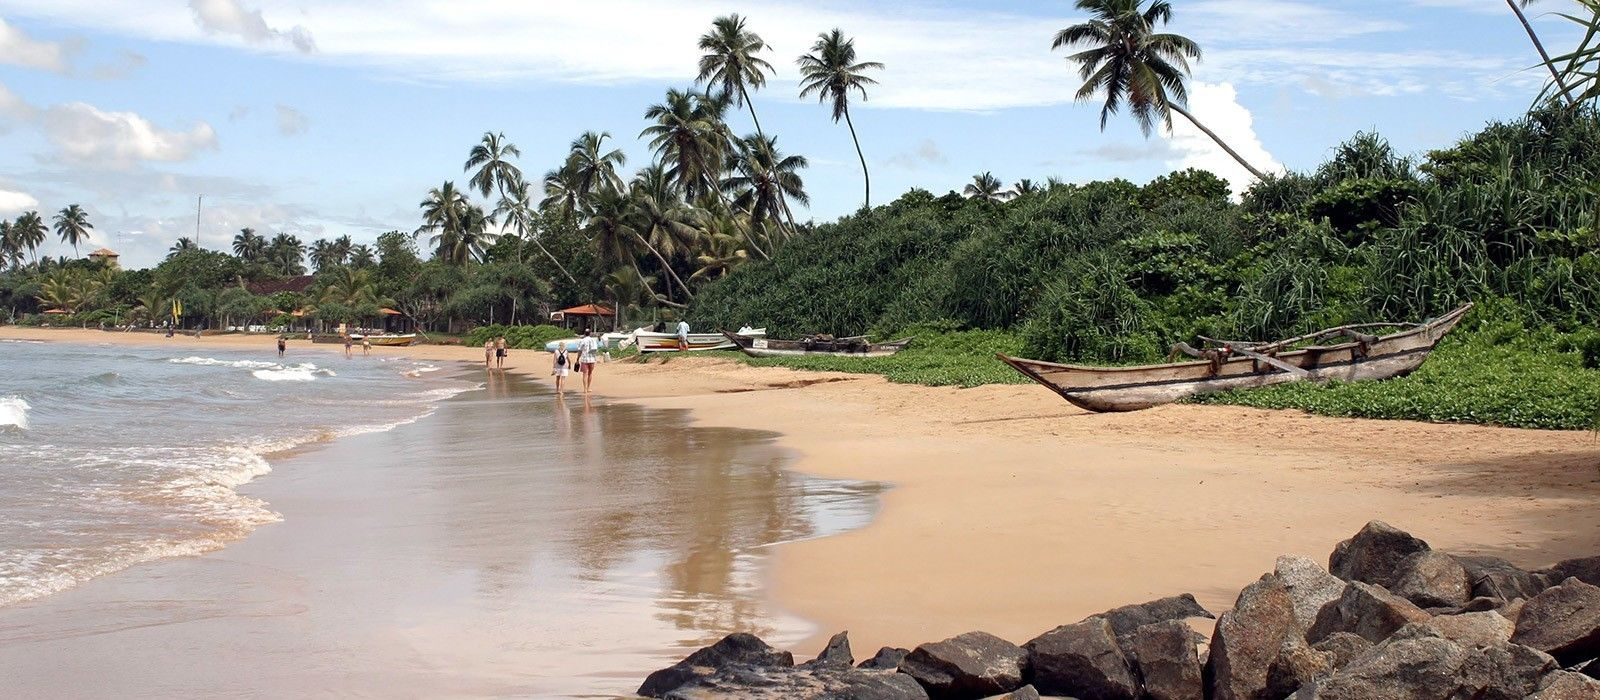 Cambodia Beaches And Islands